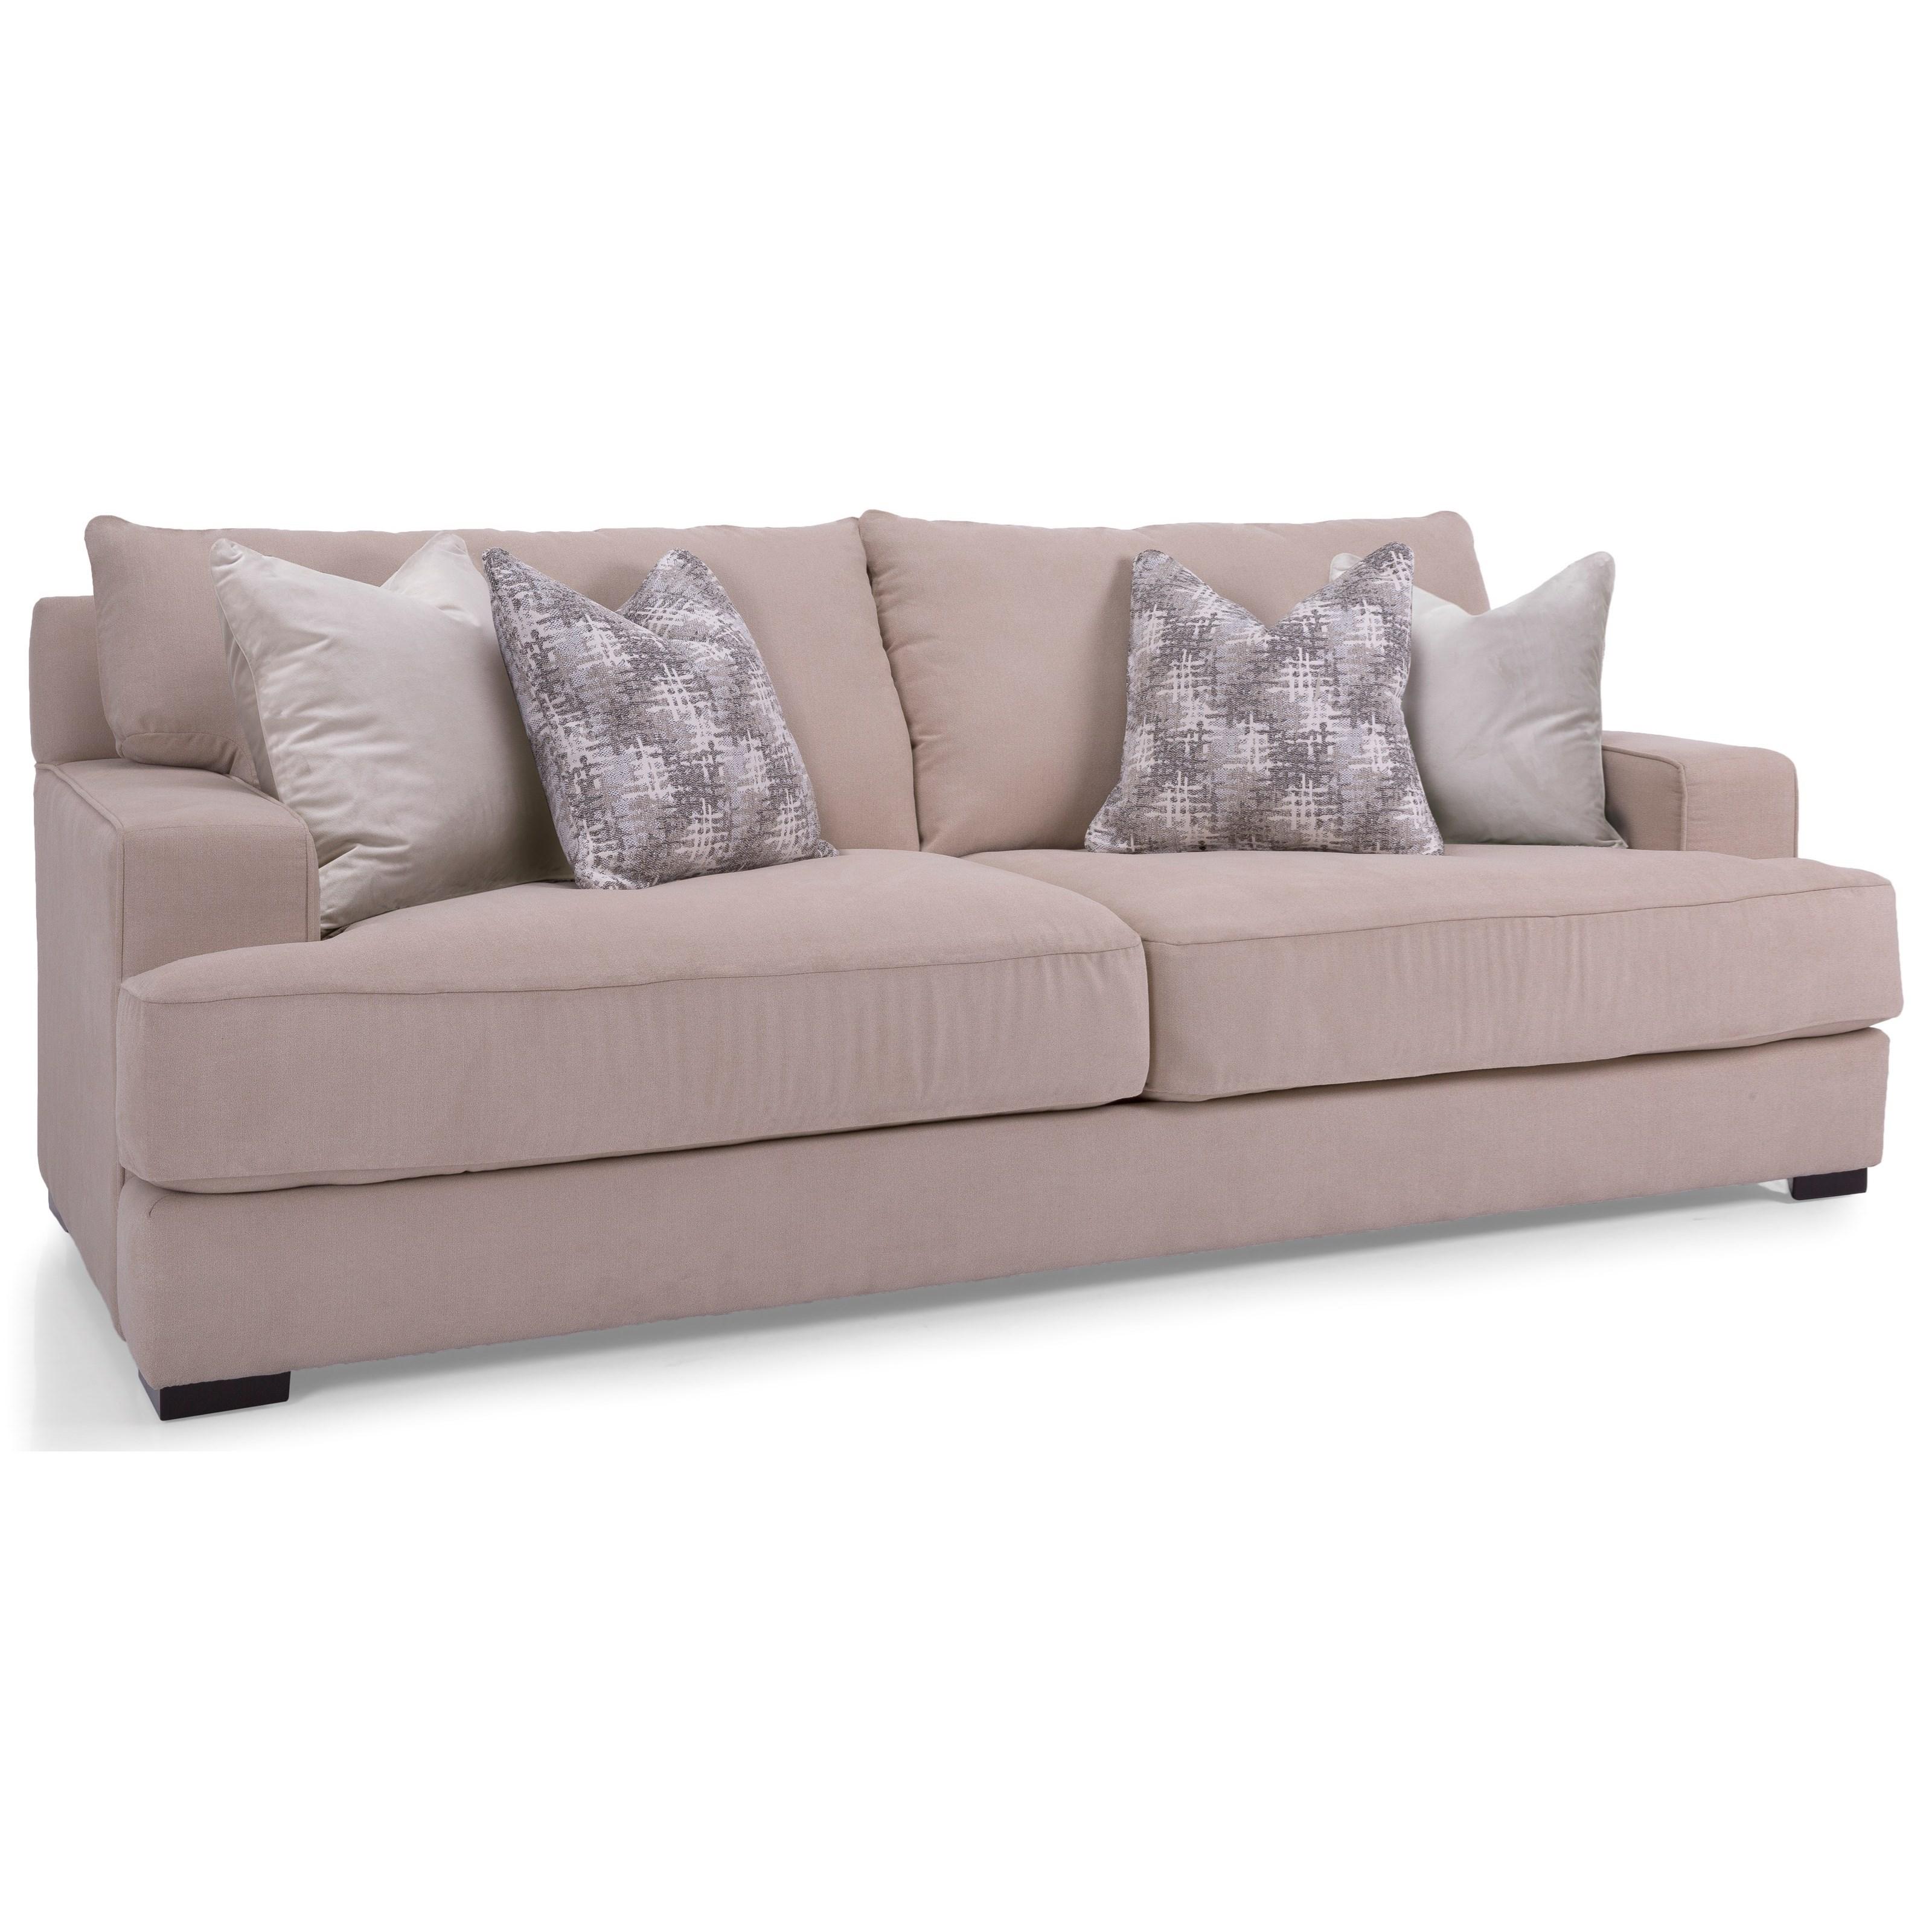 2702 Sofa by Decor-Rest at Johnny Janosik